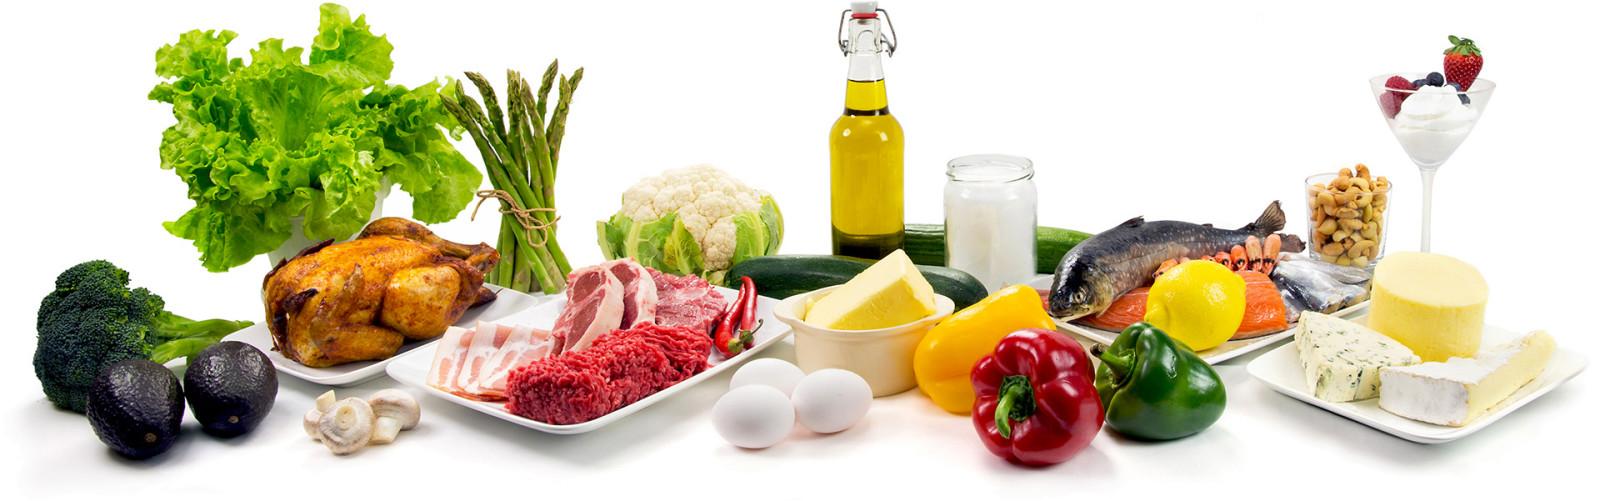 The Palto Raw Food Pic 2.jpg